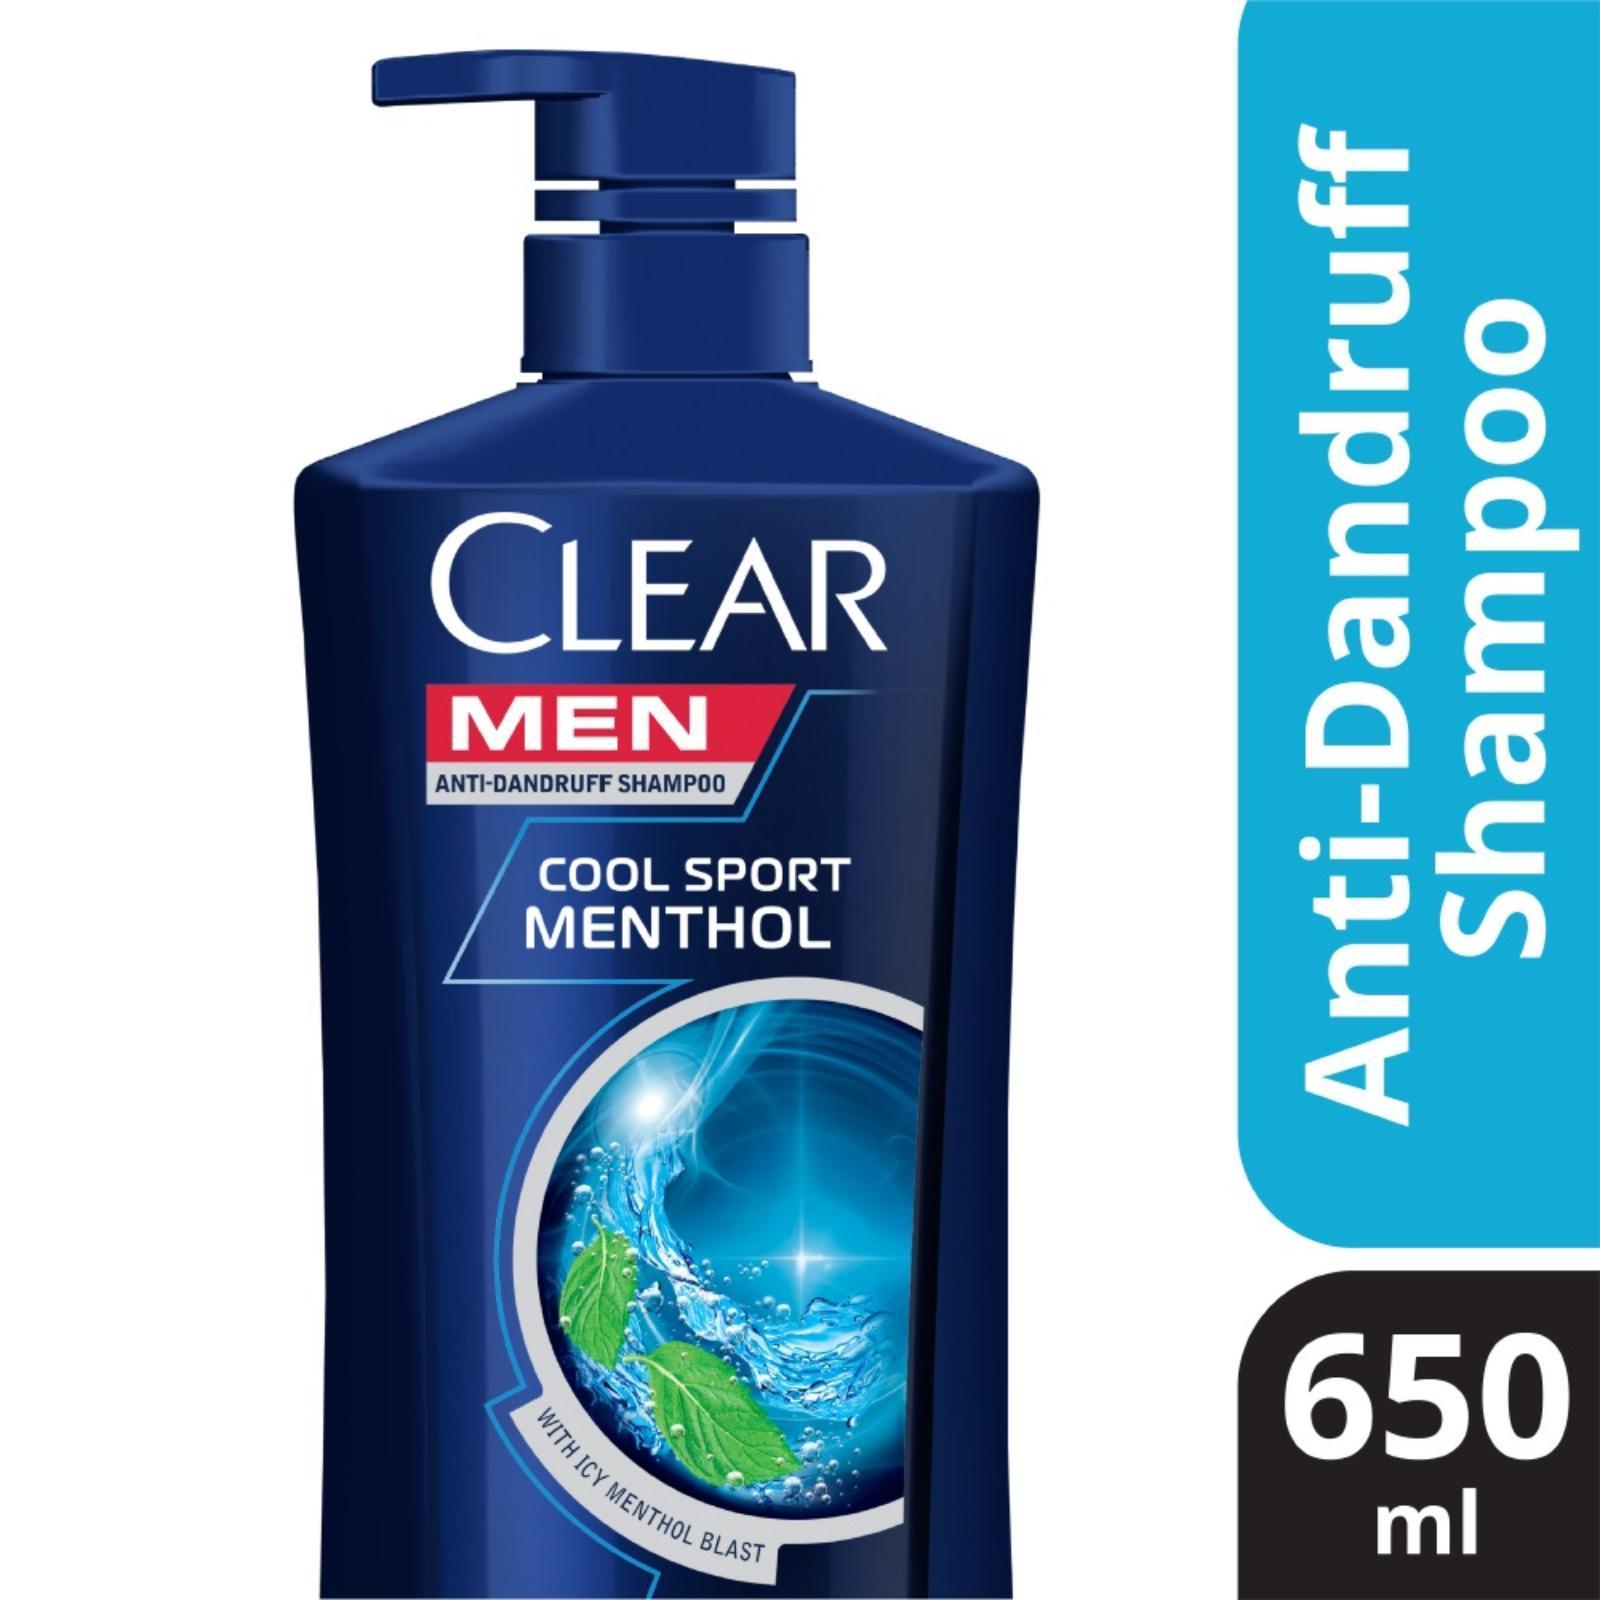 Clear Men Cool Sport Menthol Anti Dandruff Shampoo, 650ml